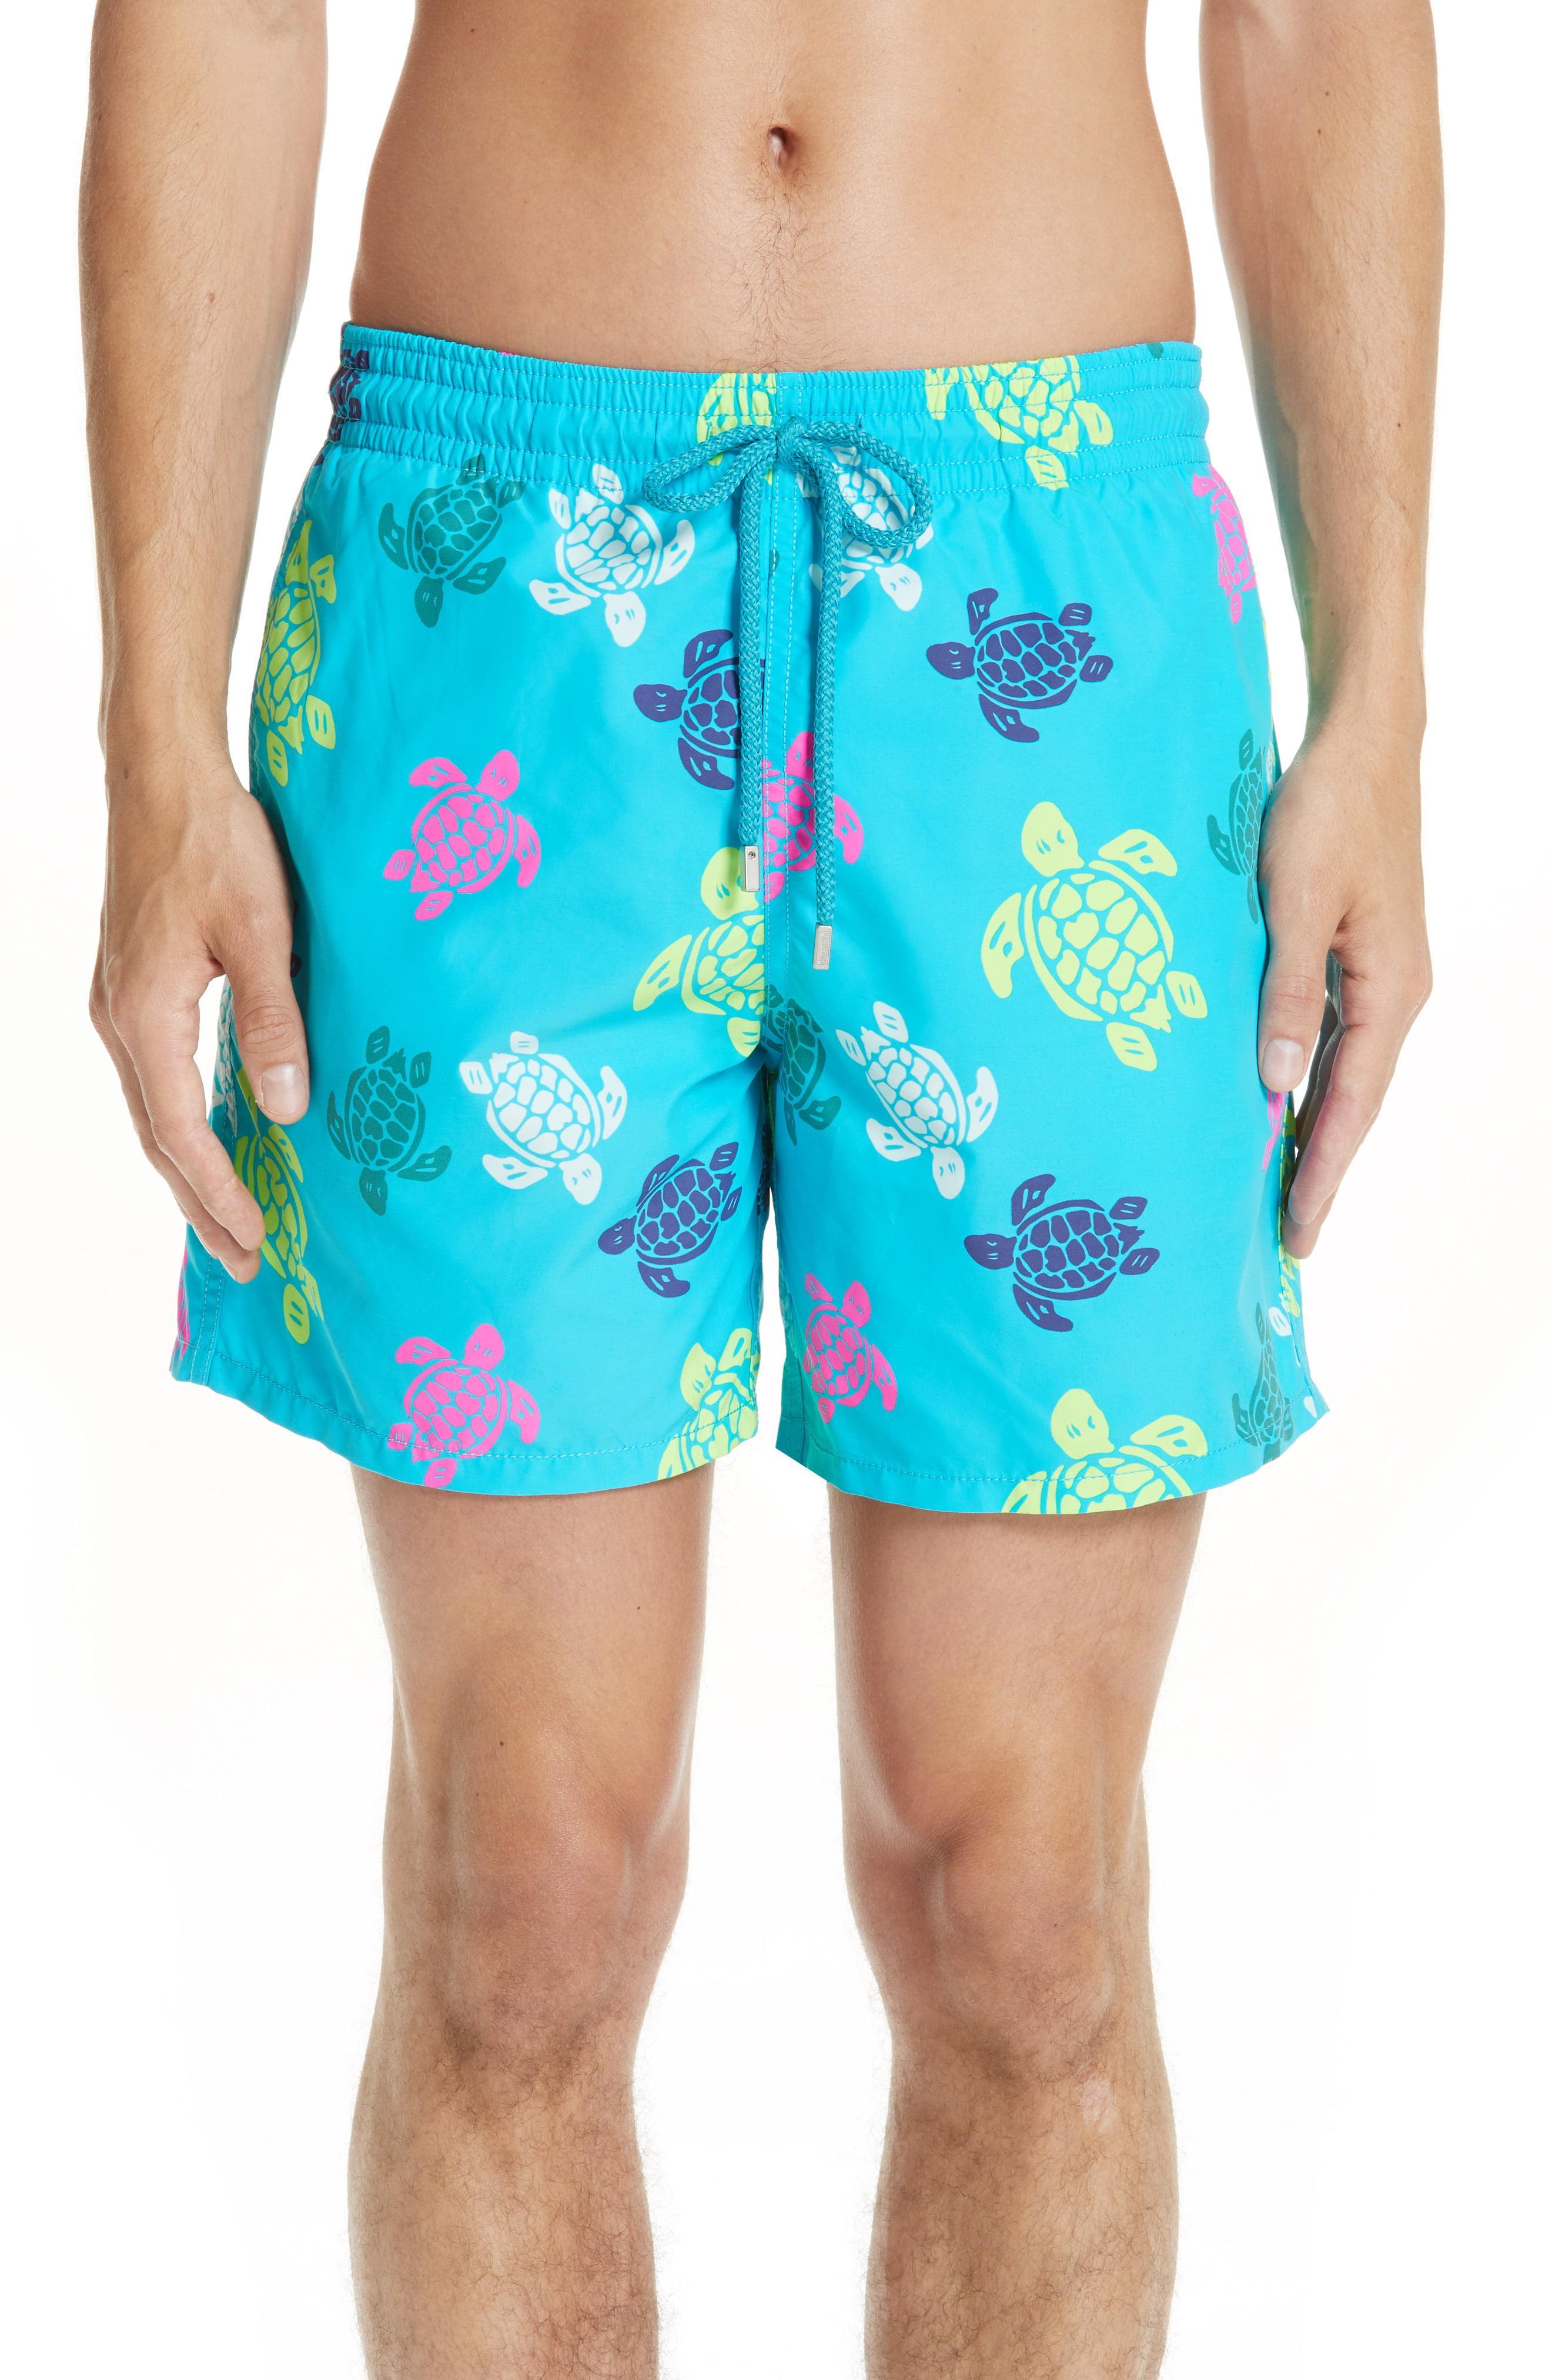 e8e0abb135 Lyst - Vilebrequin Turtle Print Swim Trunks in Blue for Men